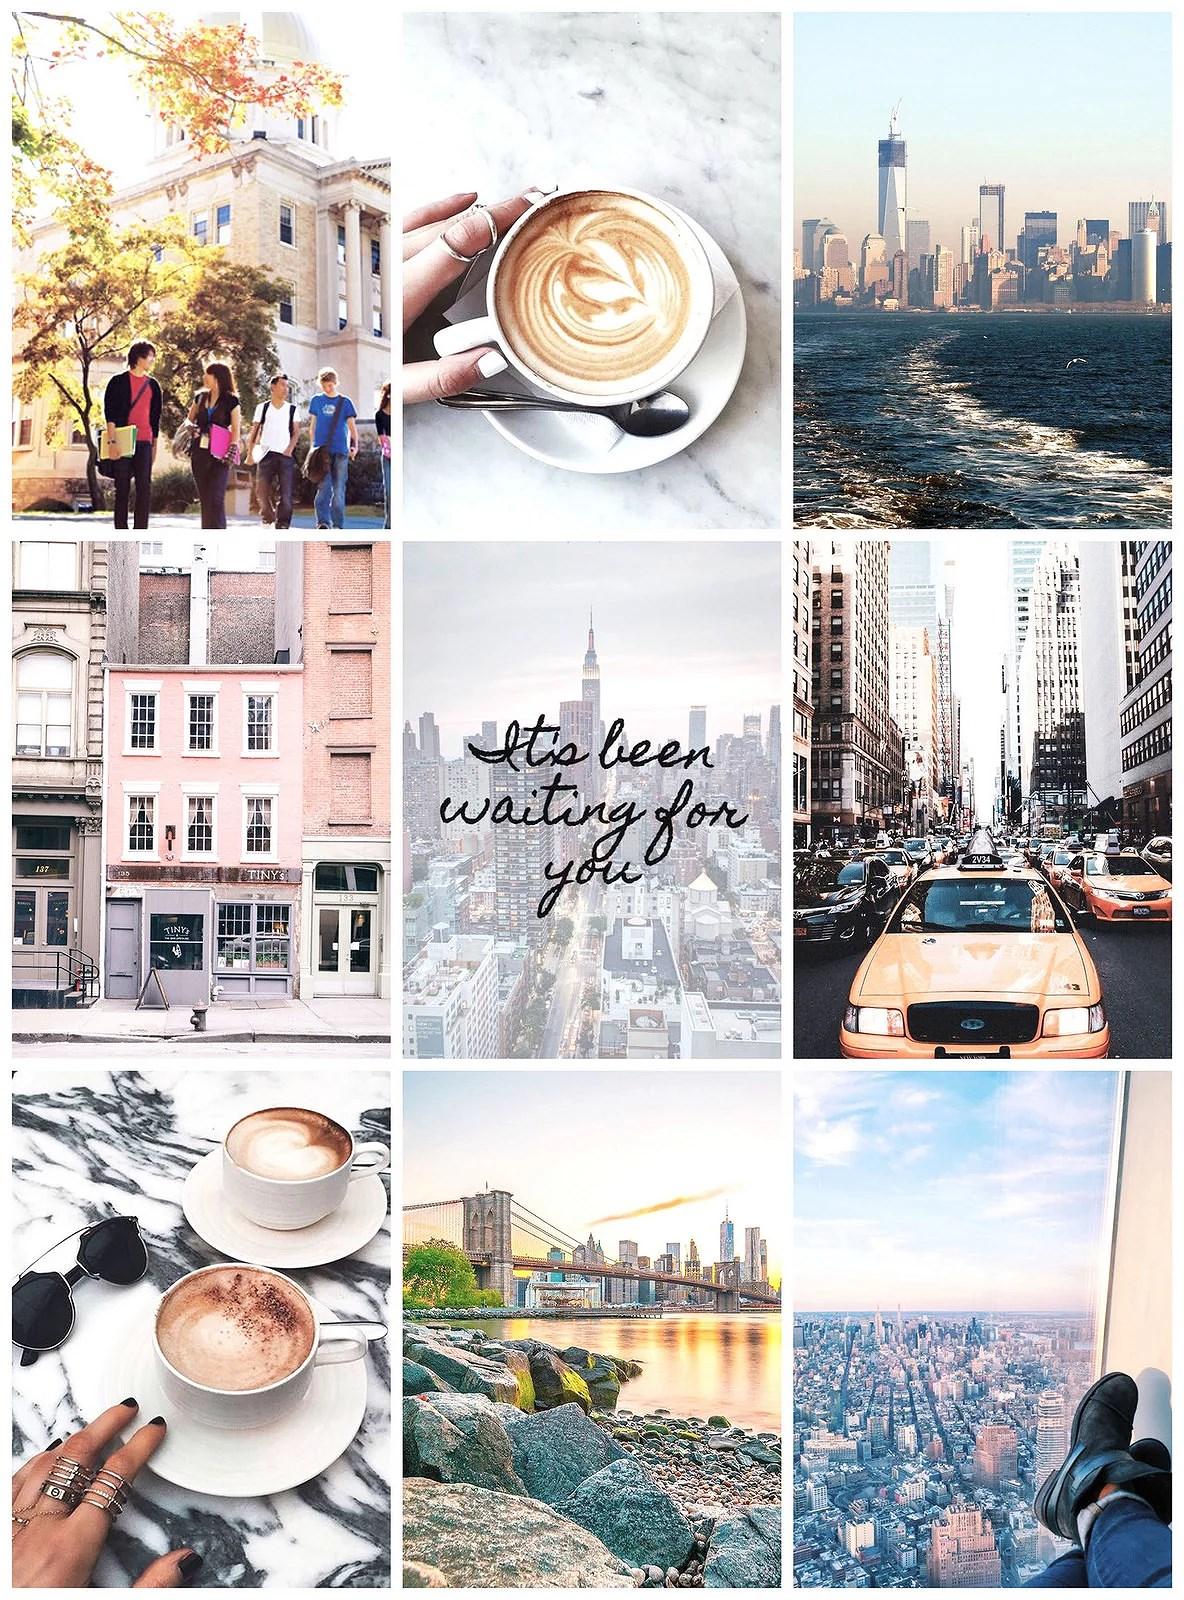 Next up: New York ♡